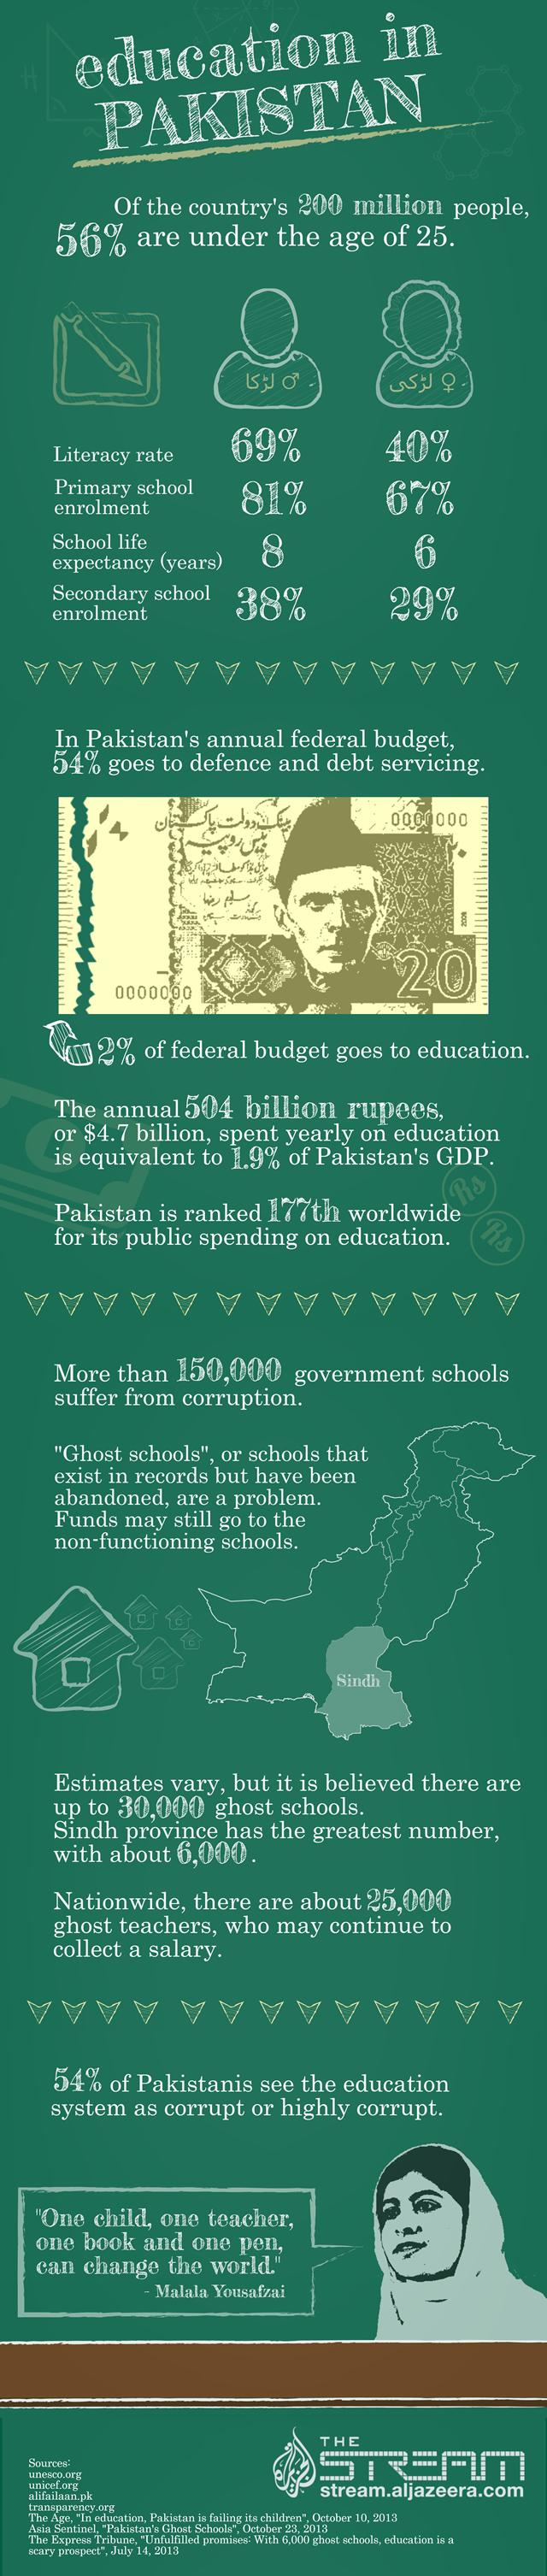 Pakistan's education hurdles